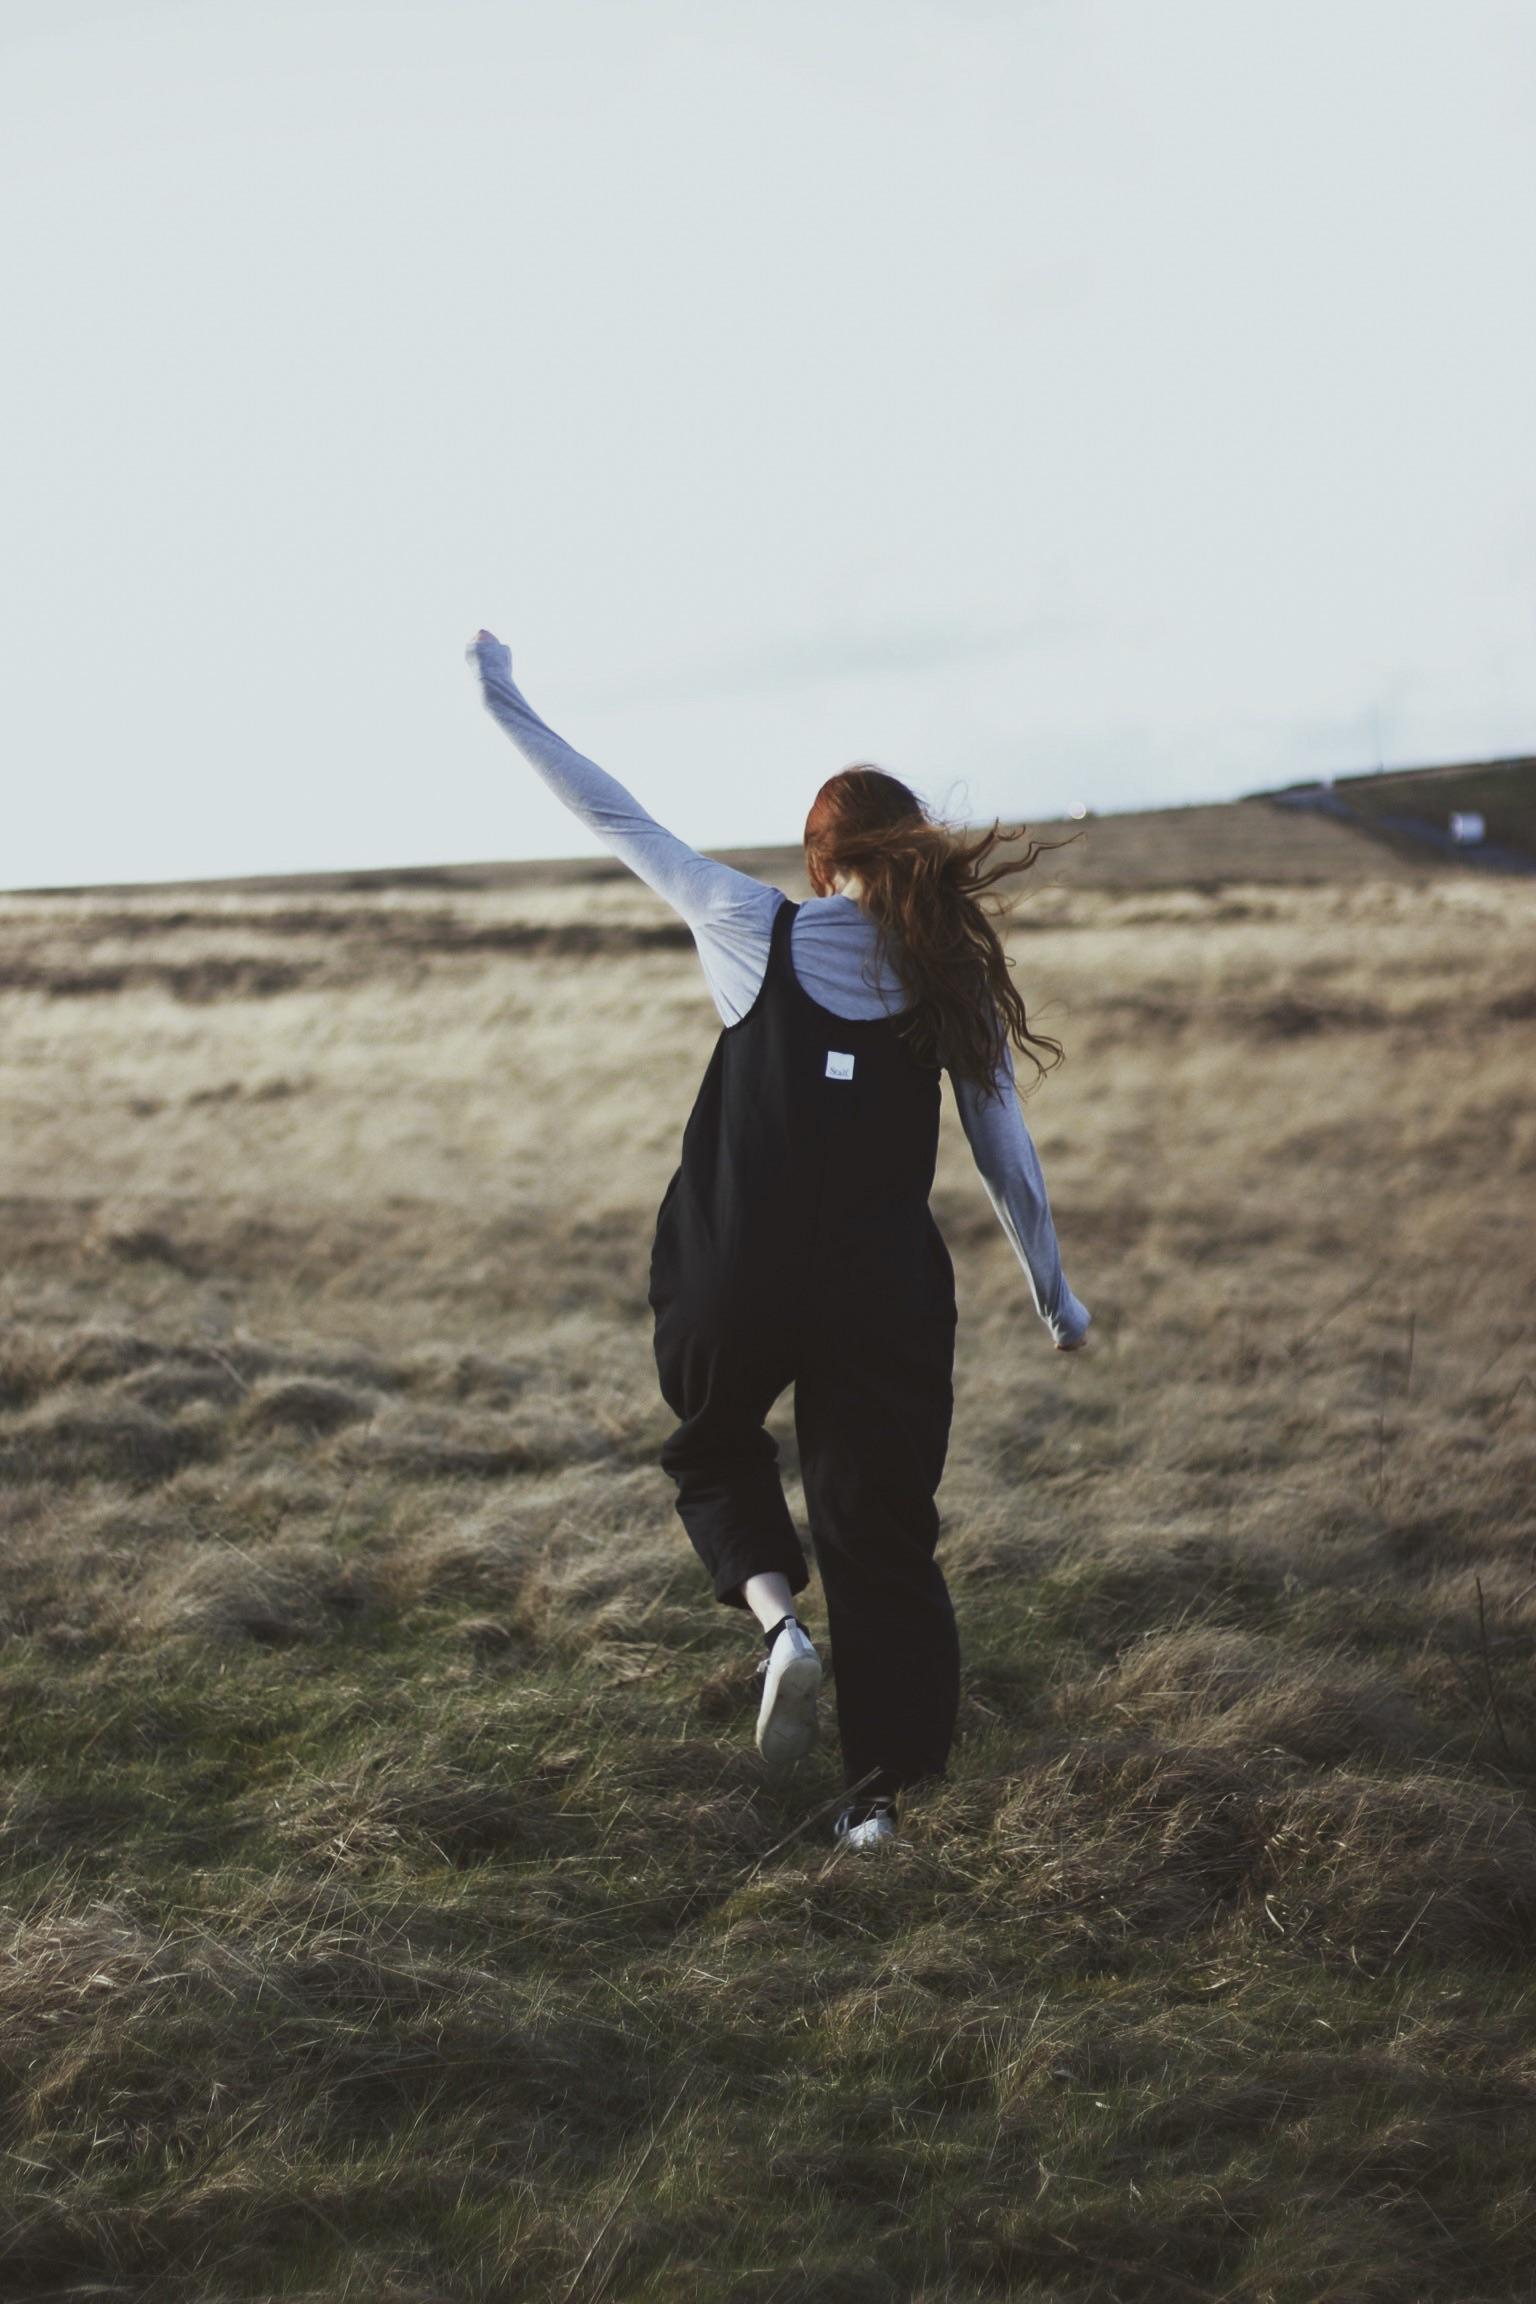 Stalf black jumpsuit | Slow, simple, timeless style